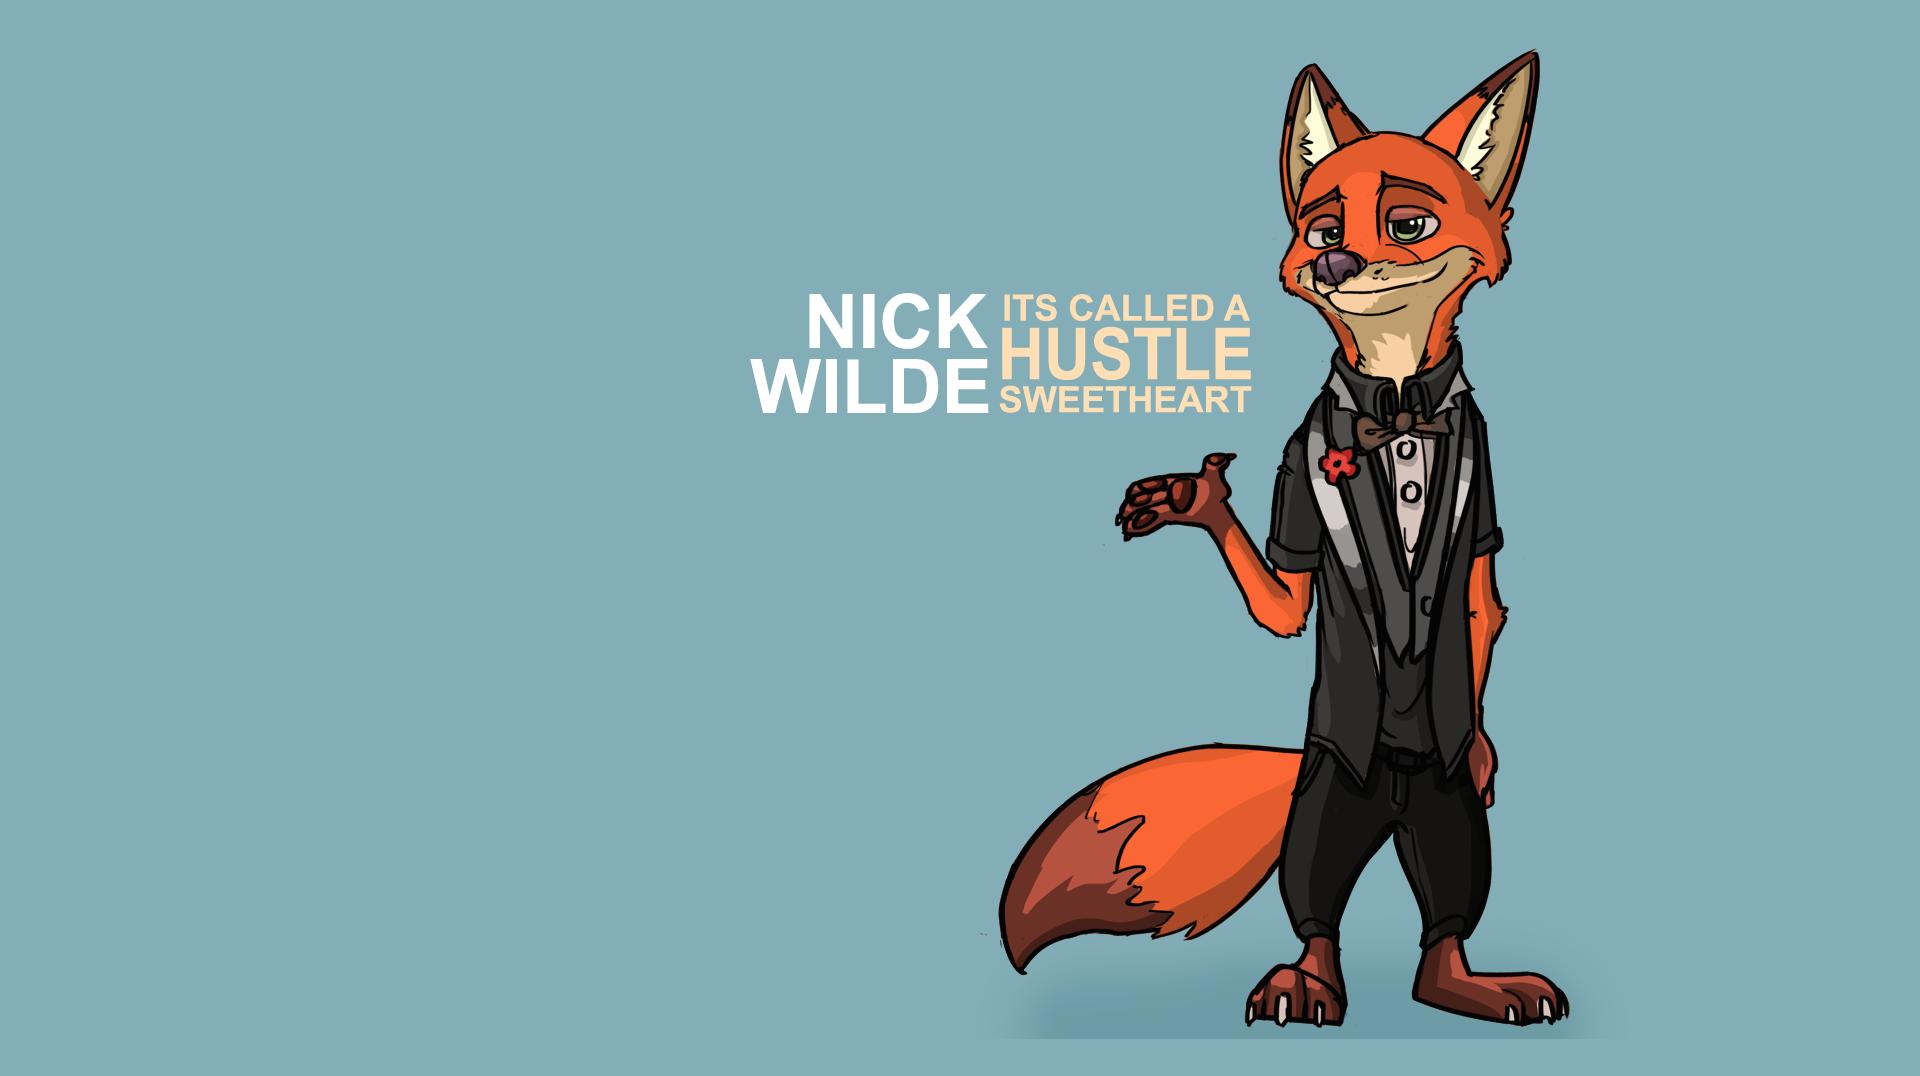 Nick Wilde Desktop Wallpaper By Blockspiration On Deviantart